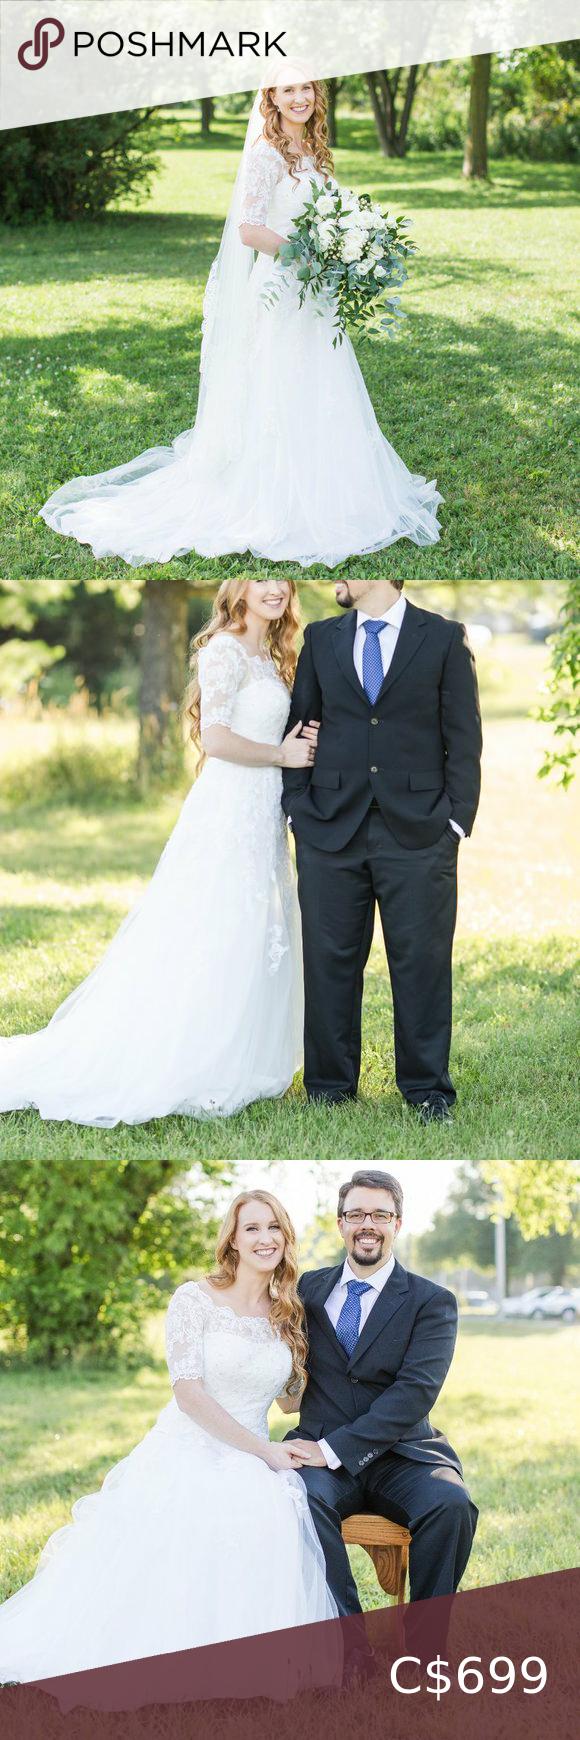 Off-white lace wedding dress Off-white lace weddin